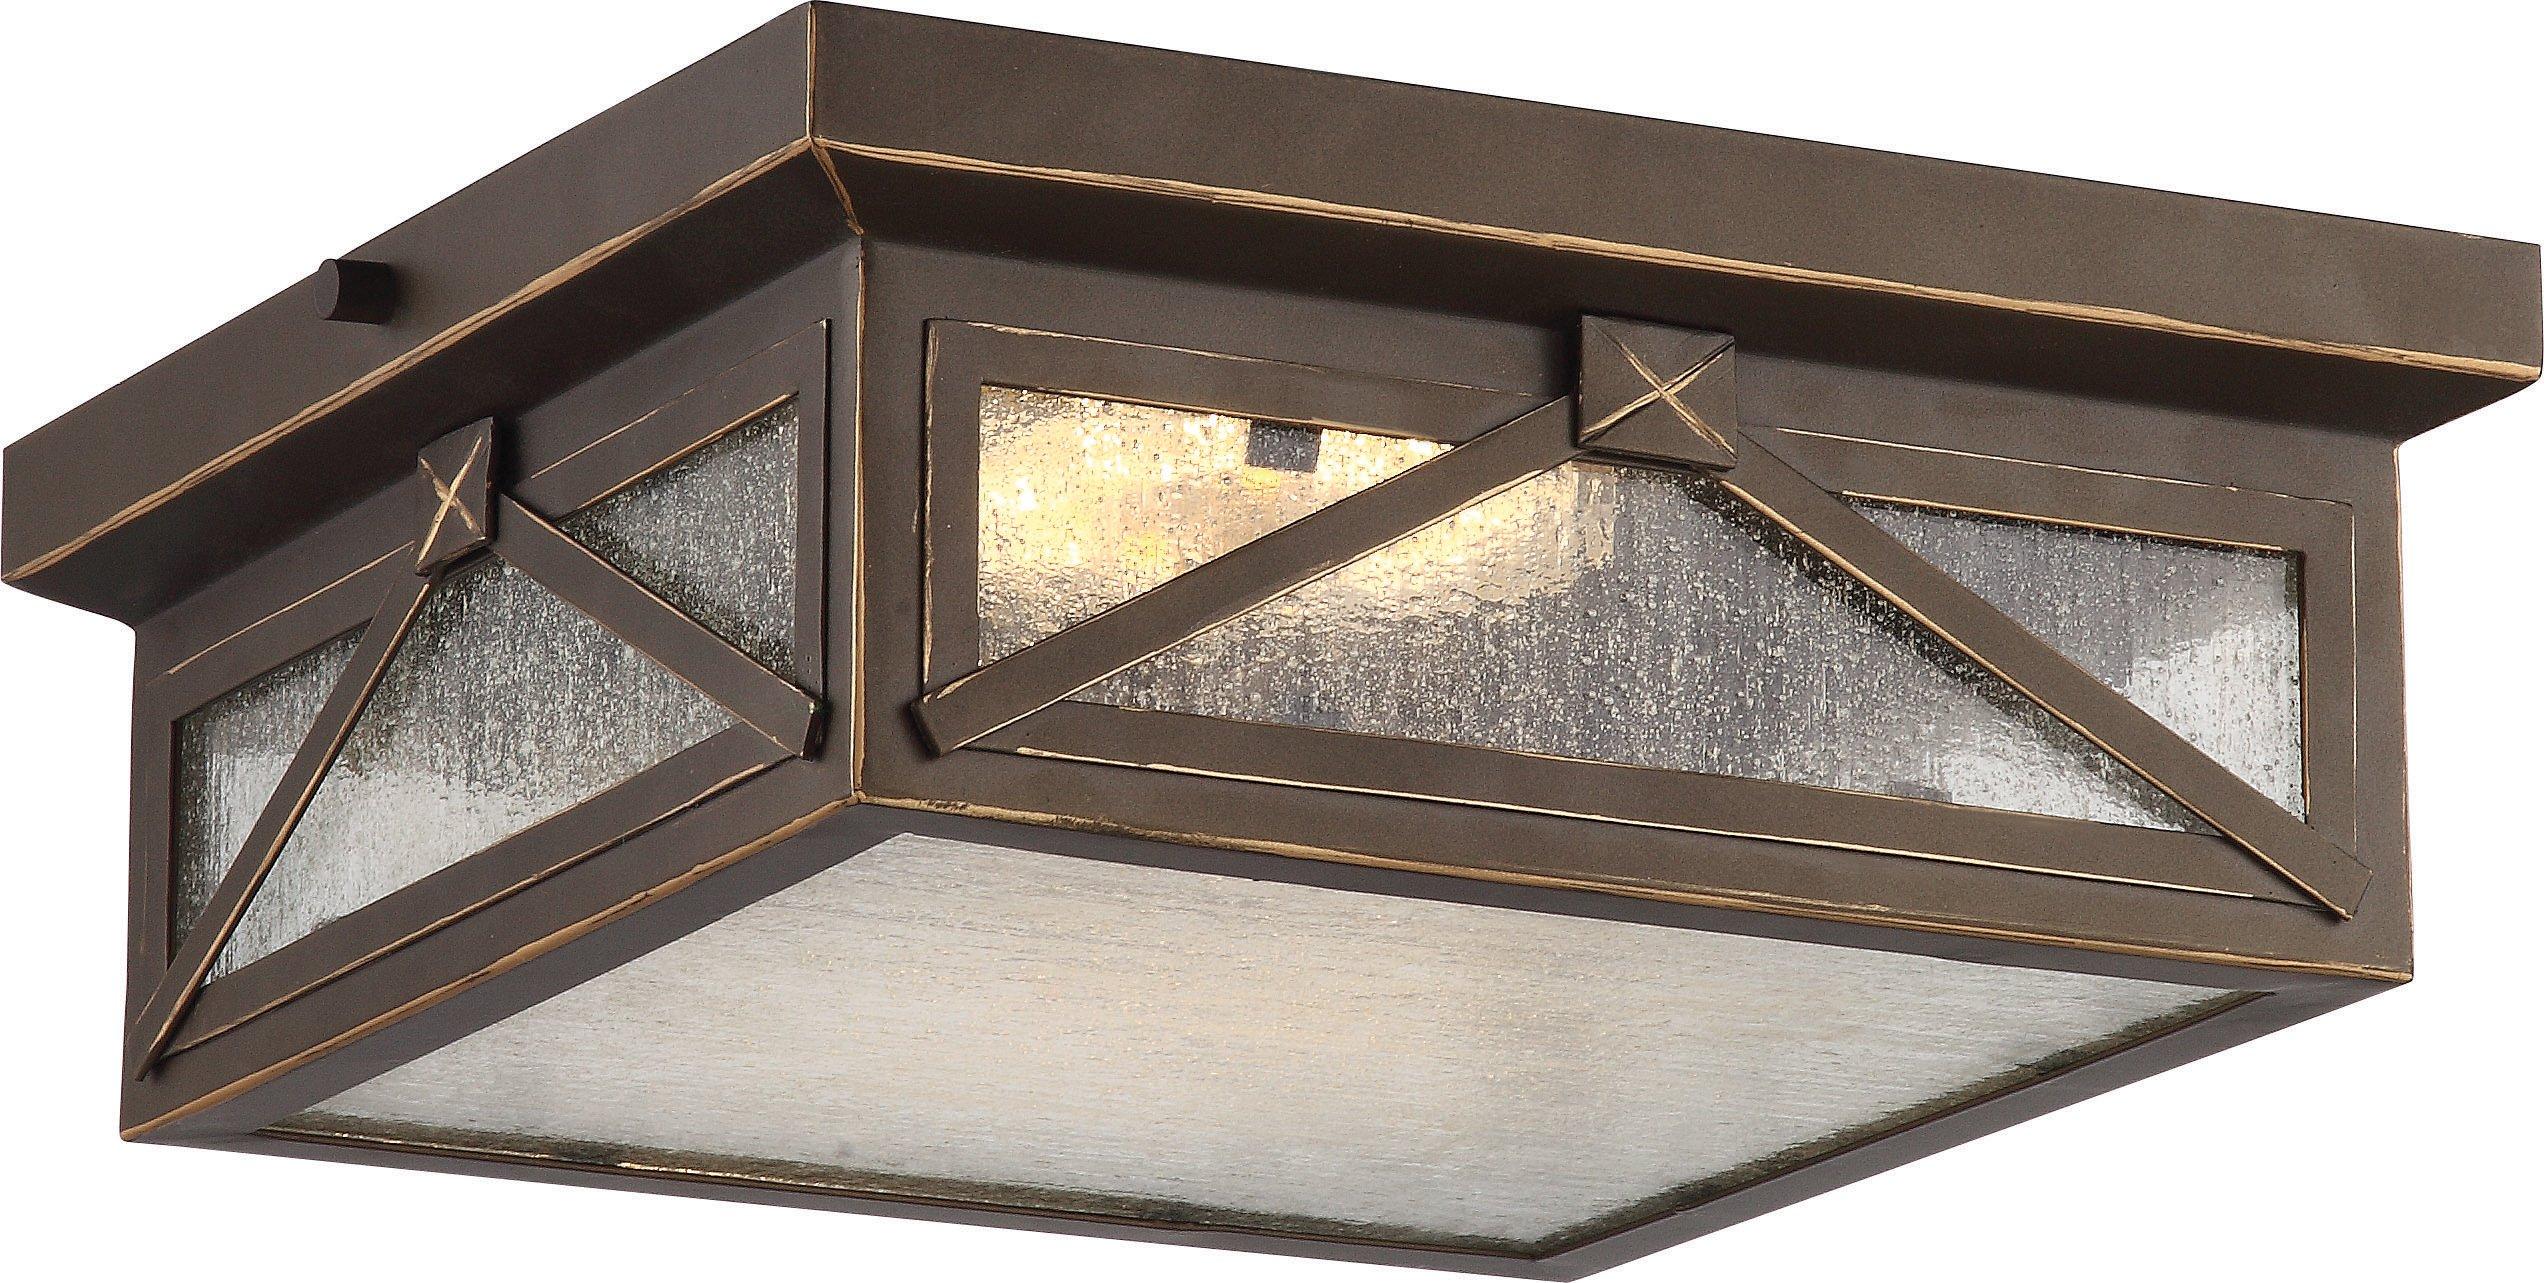 Nuvo Lighting One Light Nuvo 62/813 LED Outdoor Flush Mount, Bronze/Dark